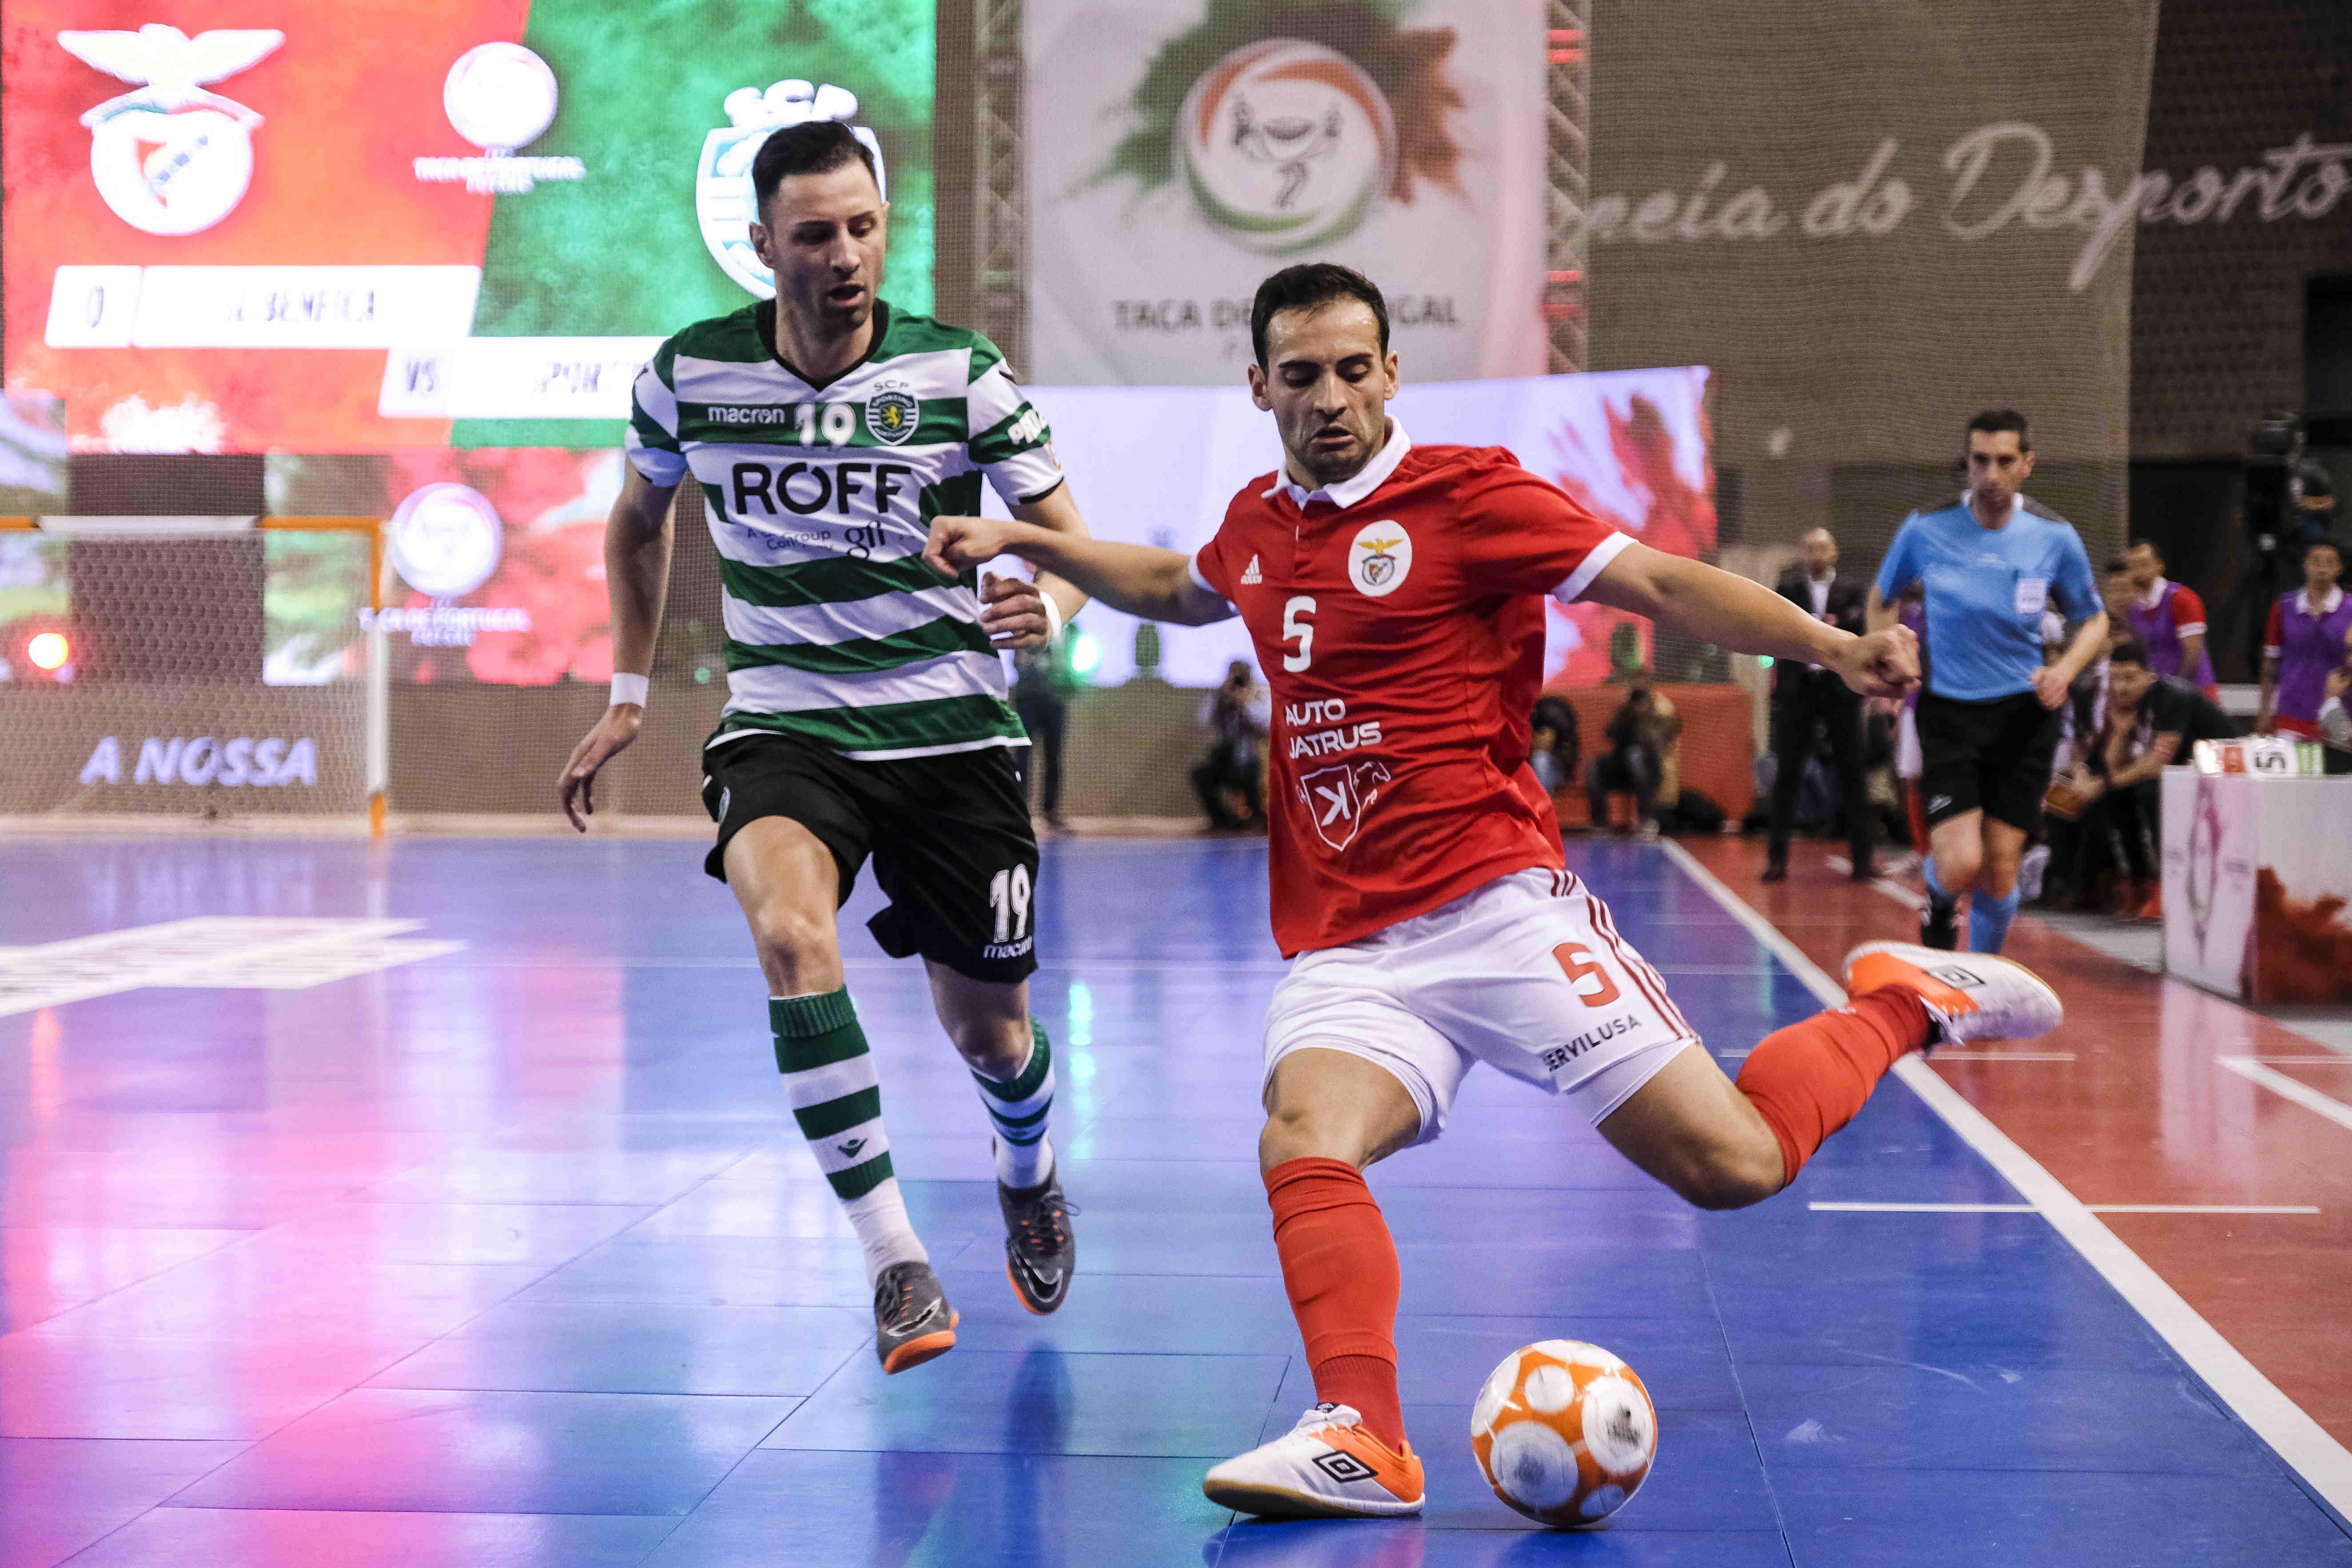 d22f9c541e Taça de Portugal Futsal - Notícias